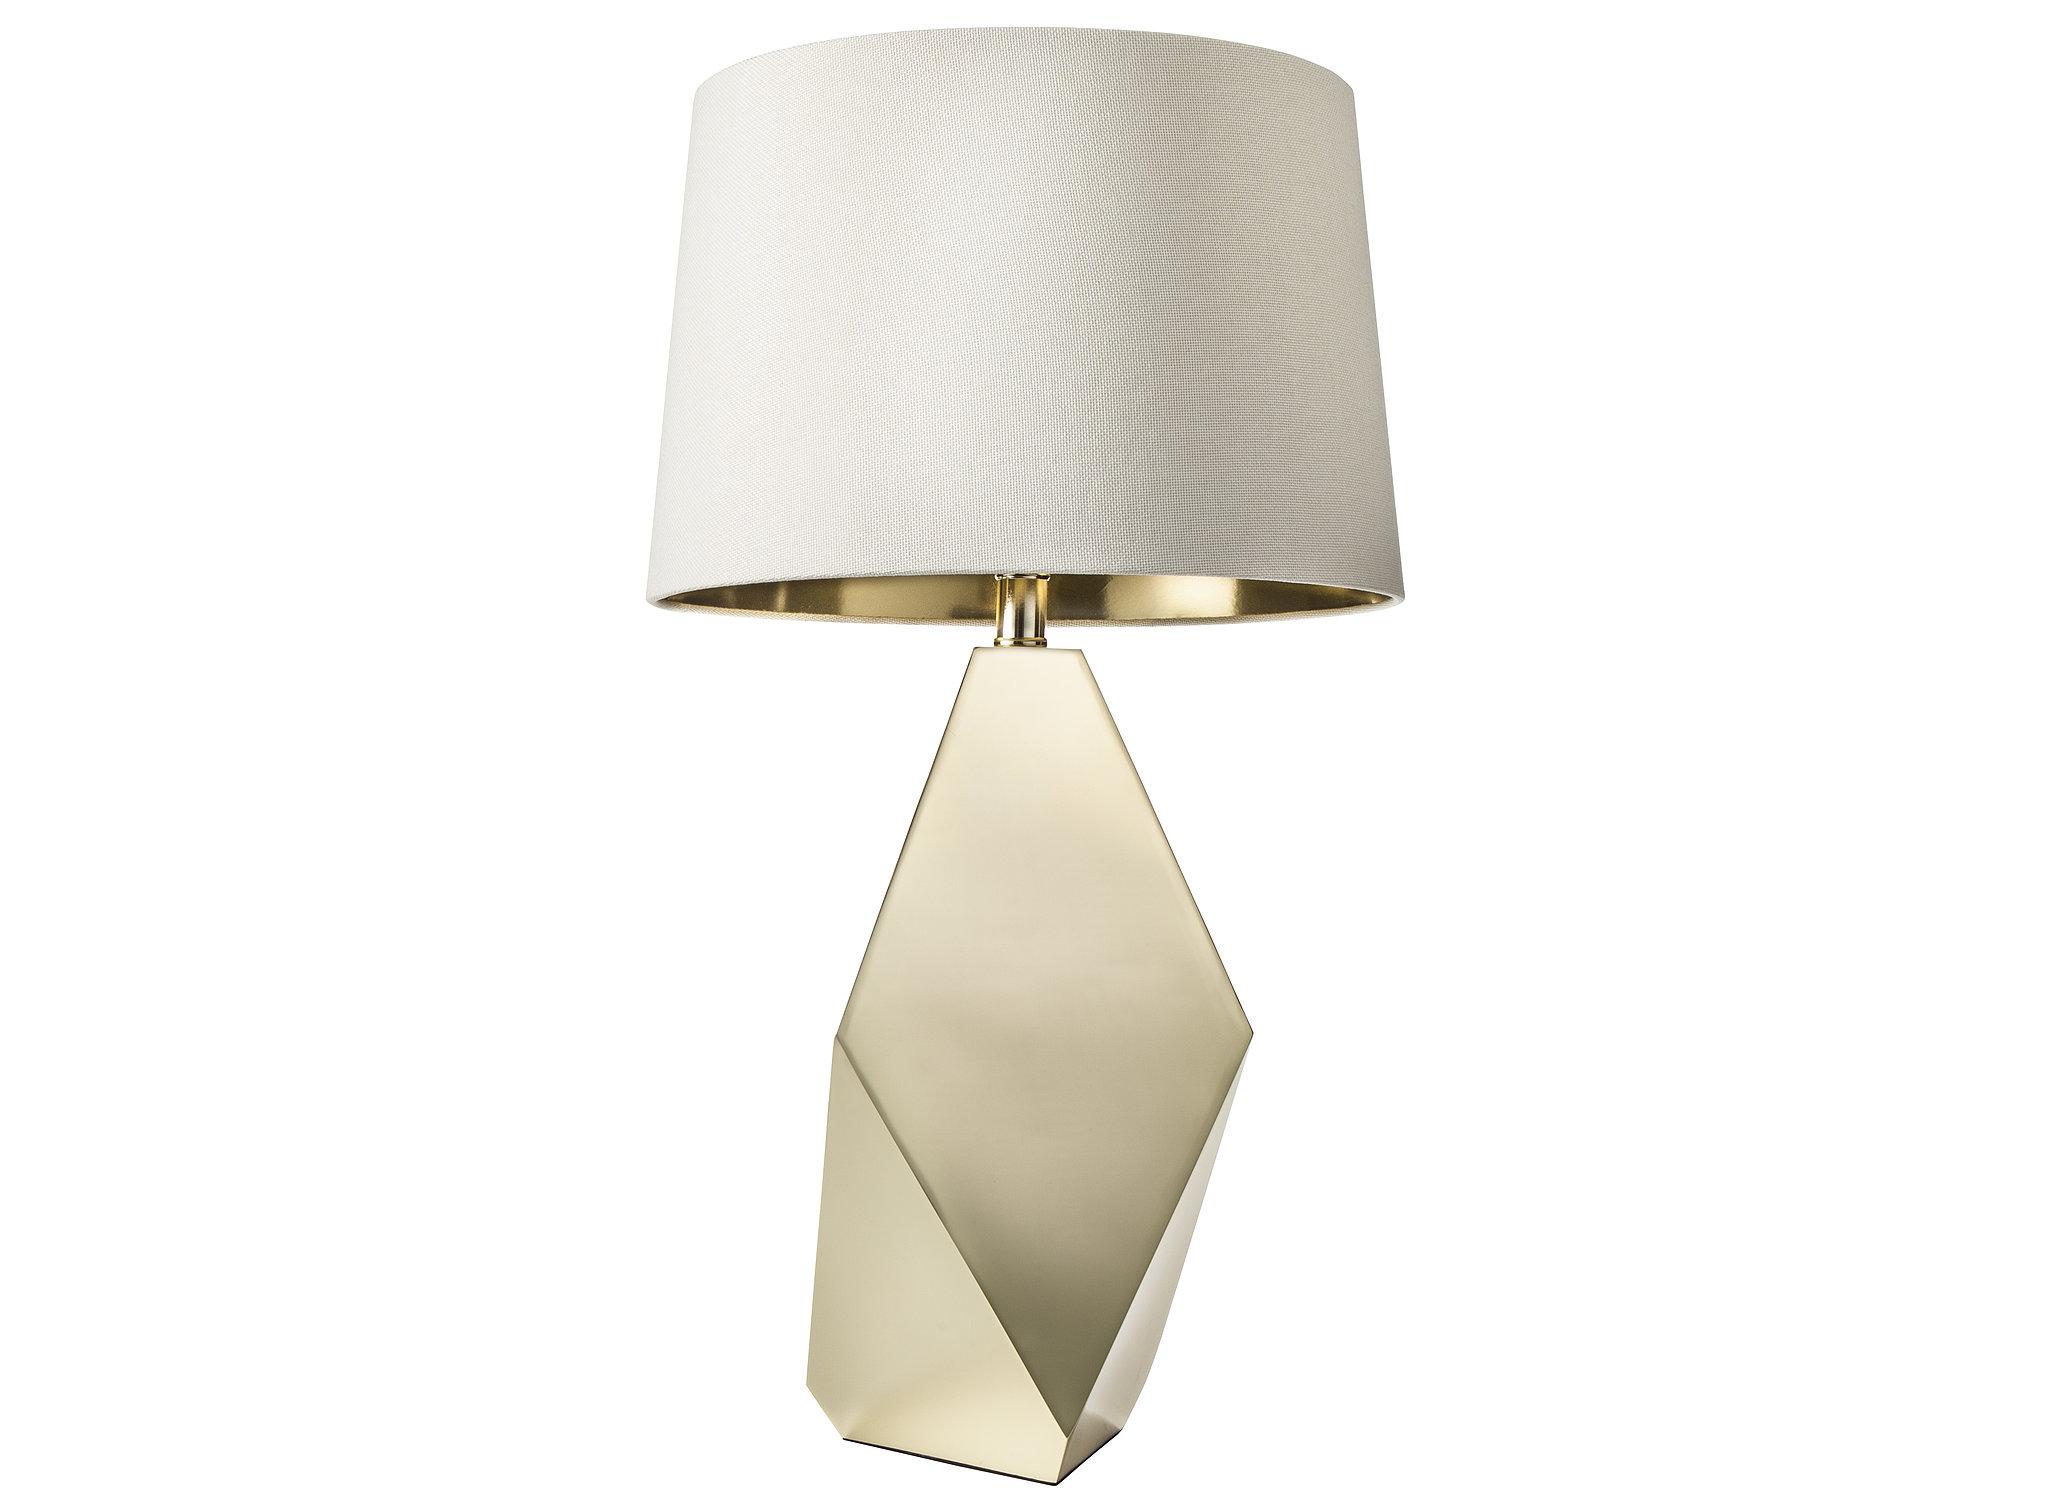 Gold Table Lamp Base ($55) and Gold Lining Lamp Shade ($25)